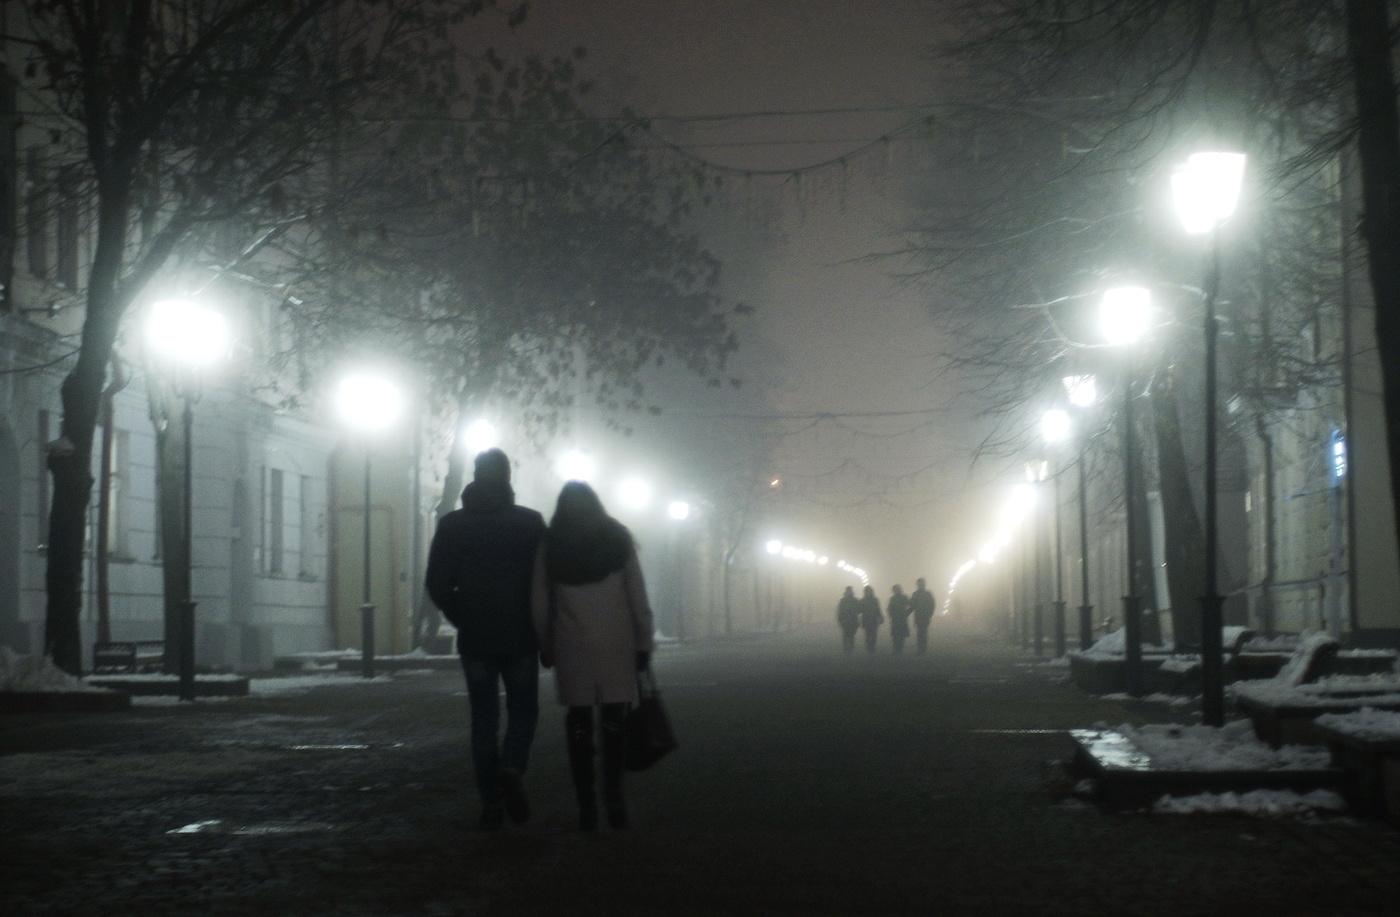 Фото вечерний туман в городе